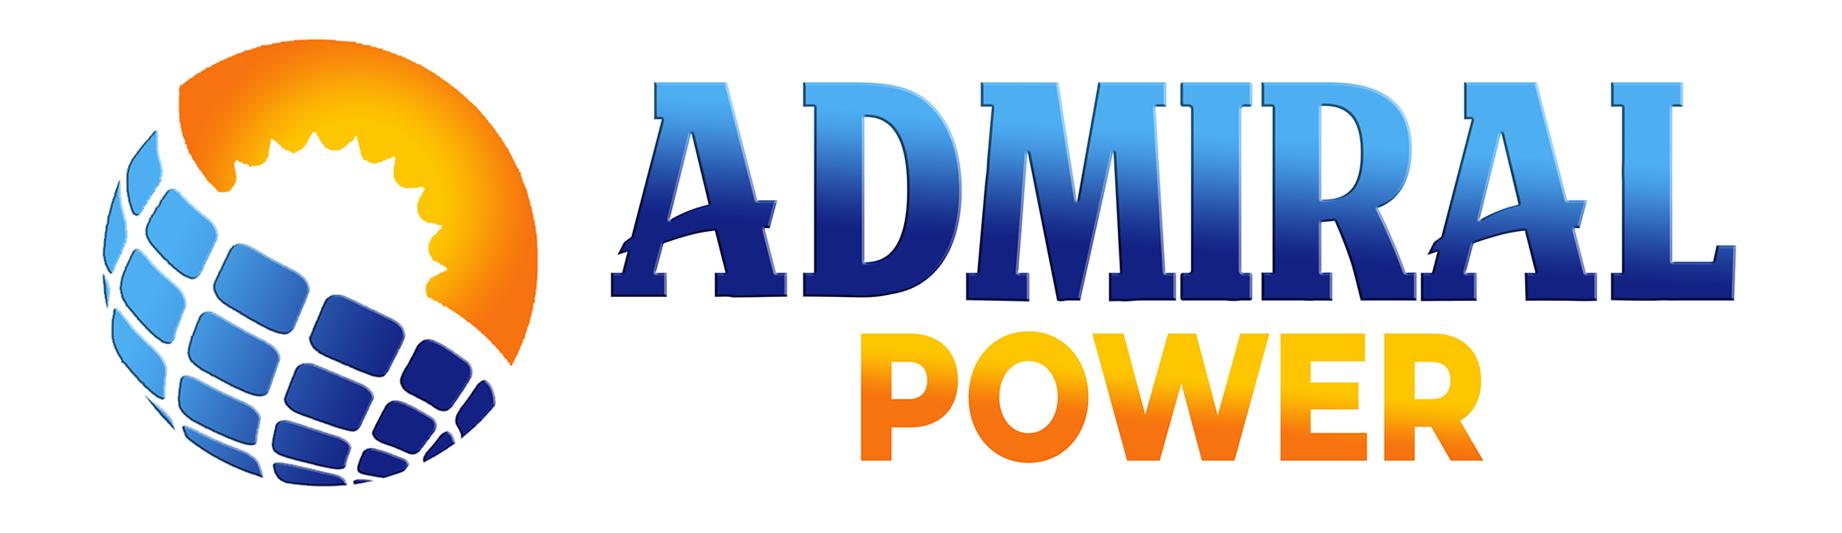 Admiral-Power-Logo-002